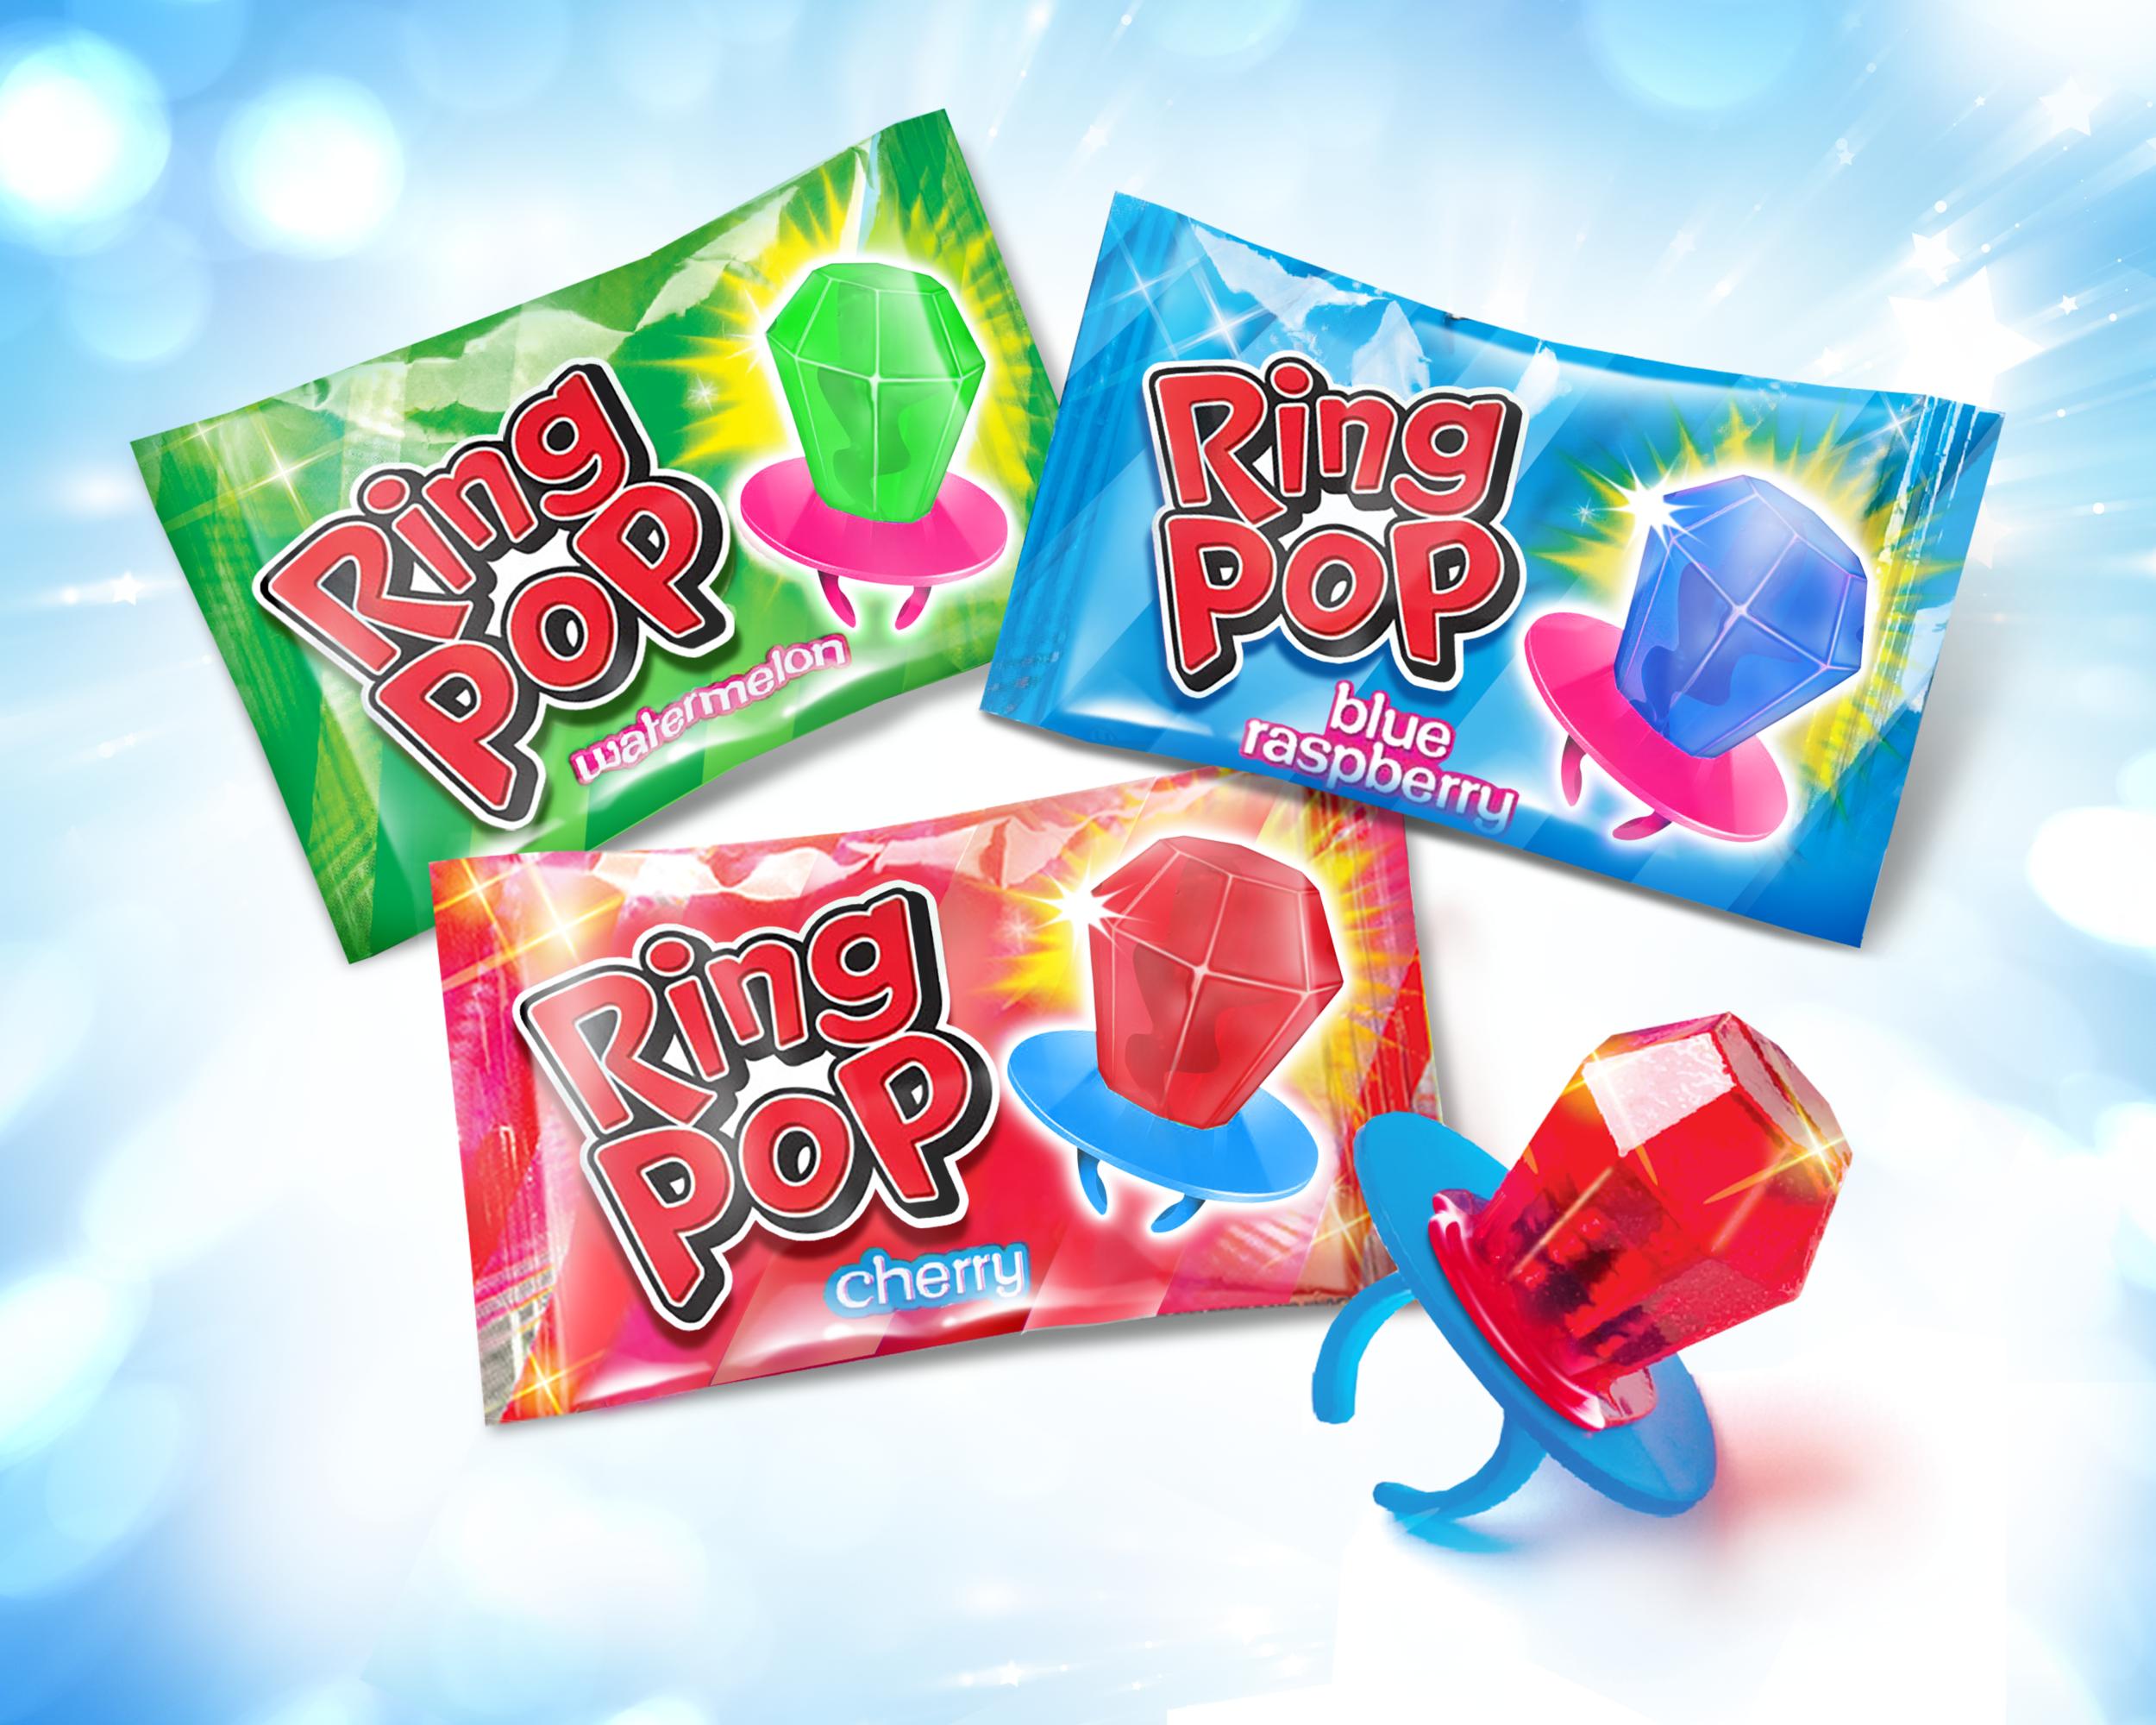 ringpop_flavors_018.png